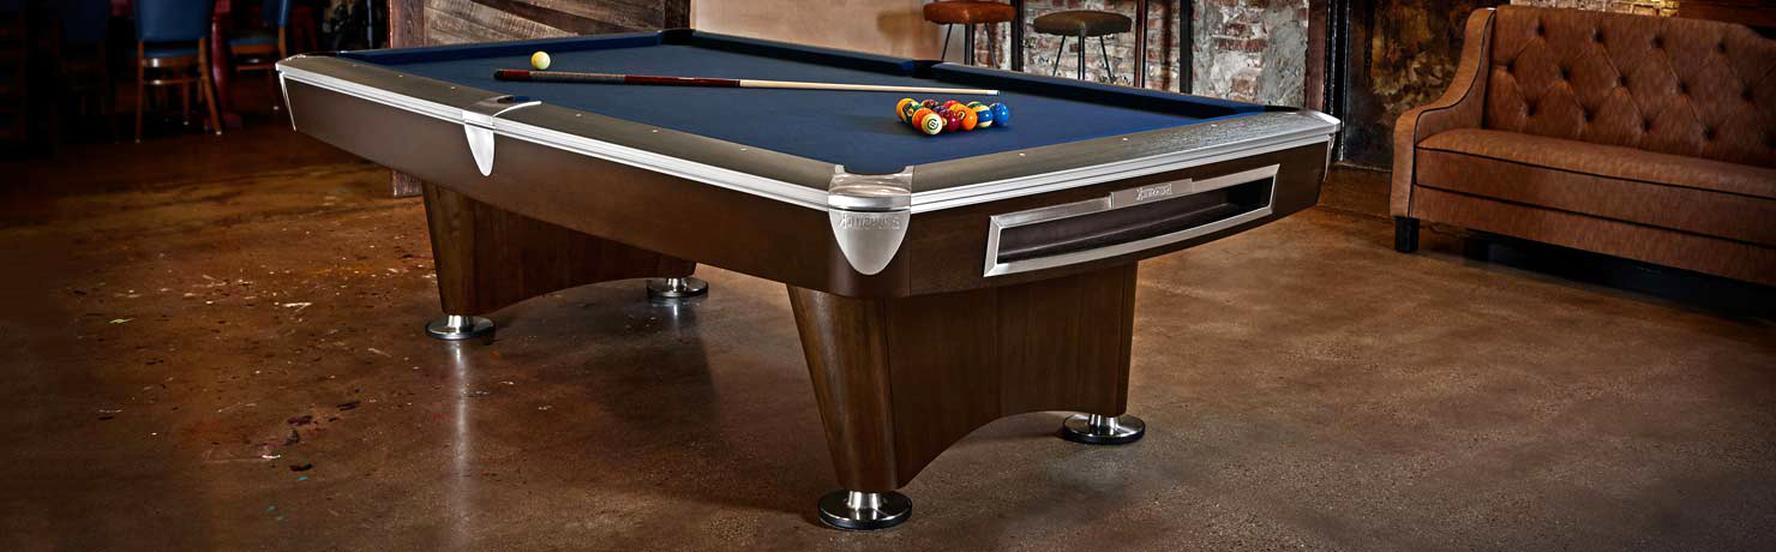 brunswick billiards for sale